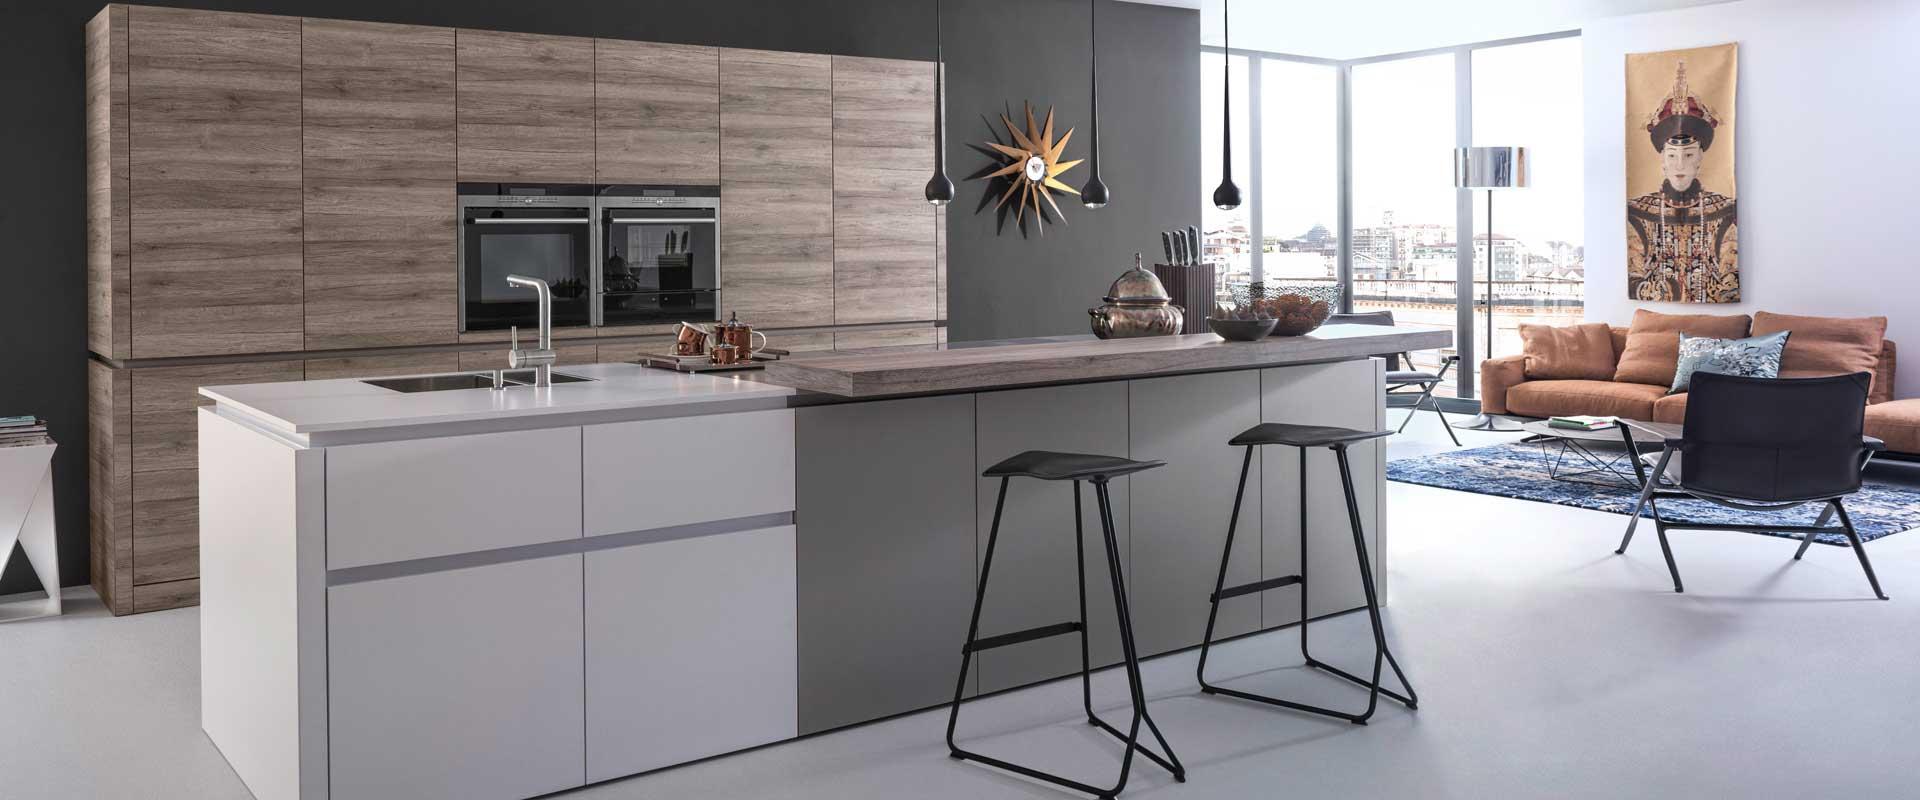 Moderne keuken via Uw KeueknSpeciaalzaak